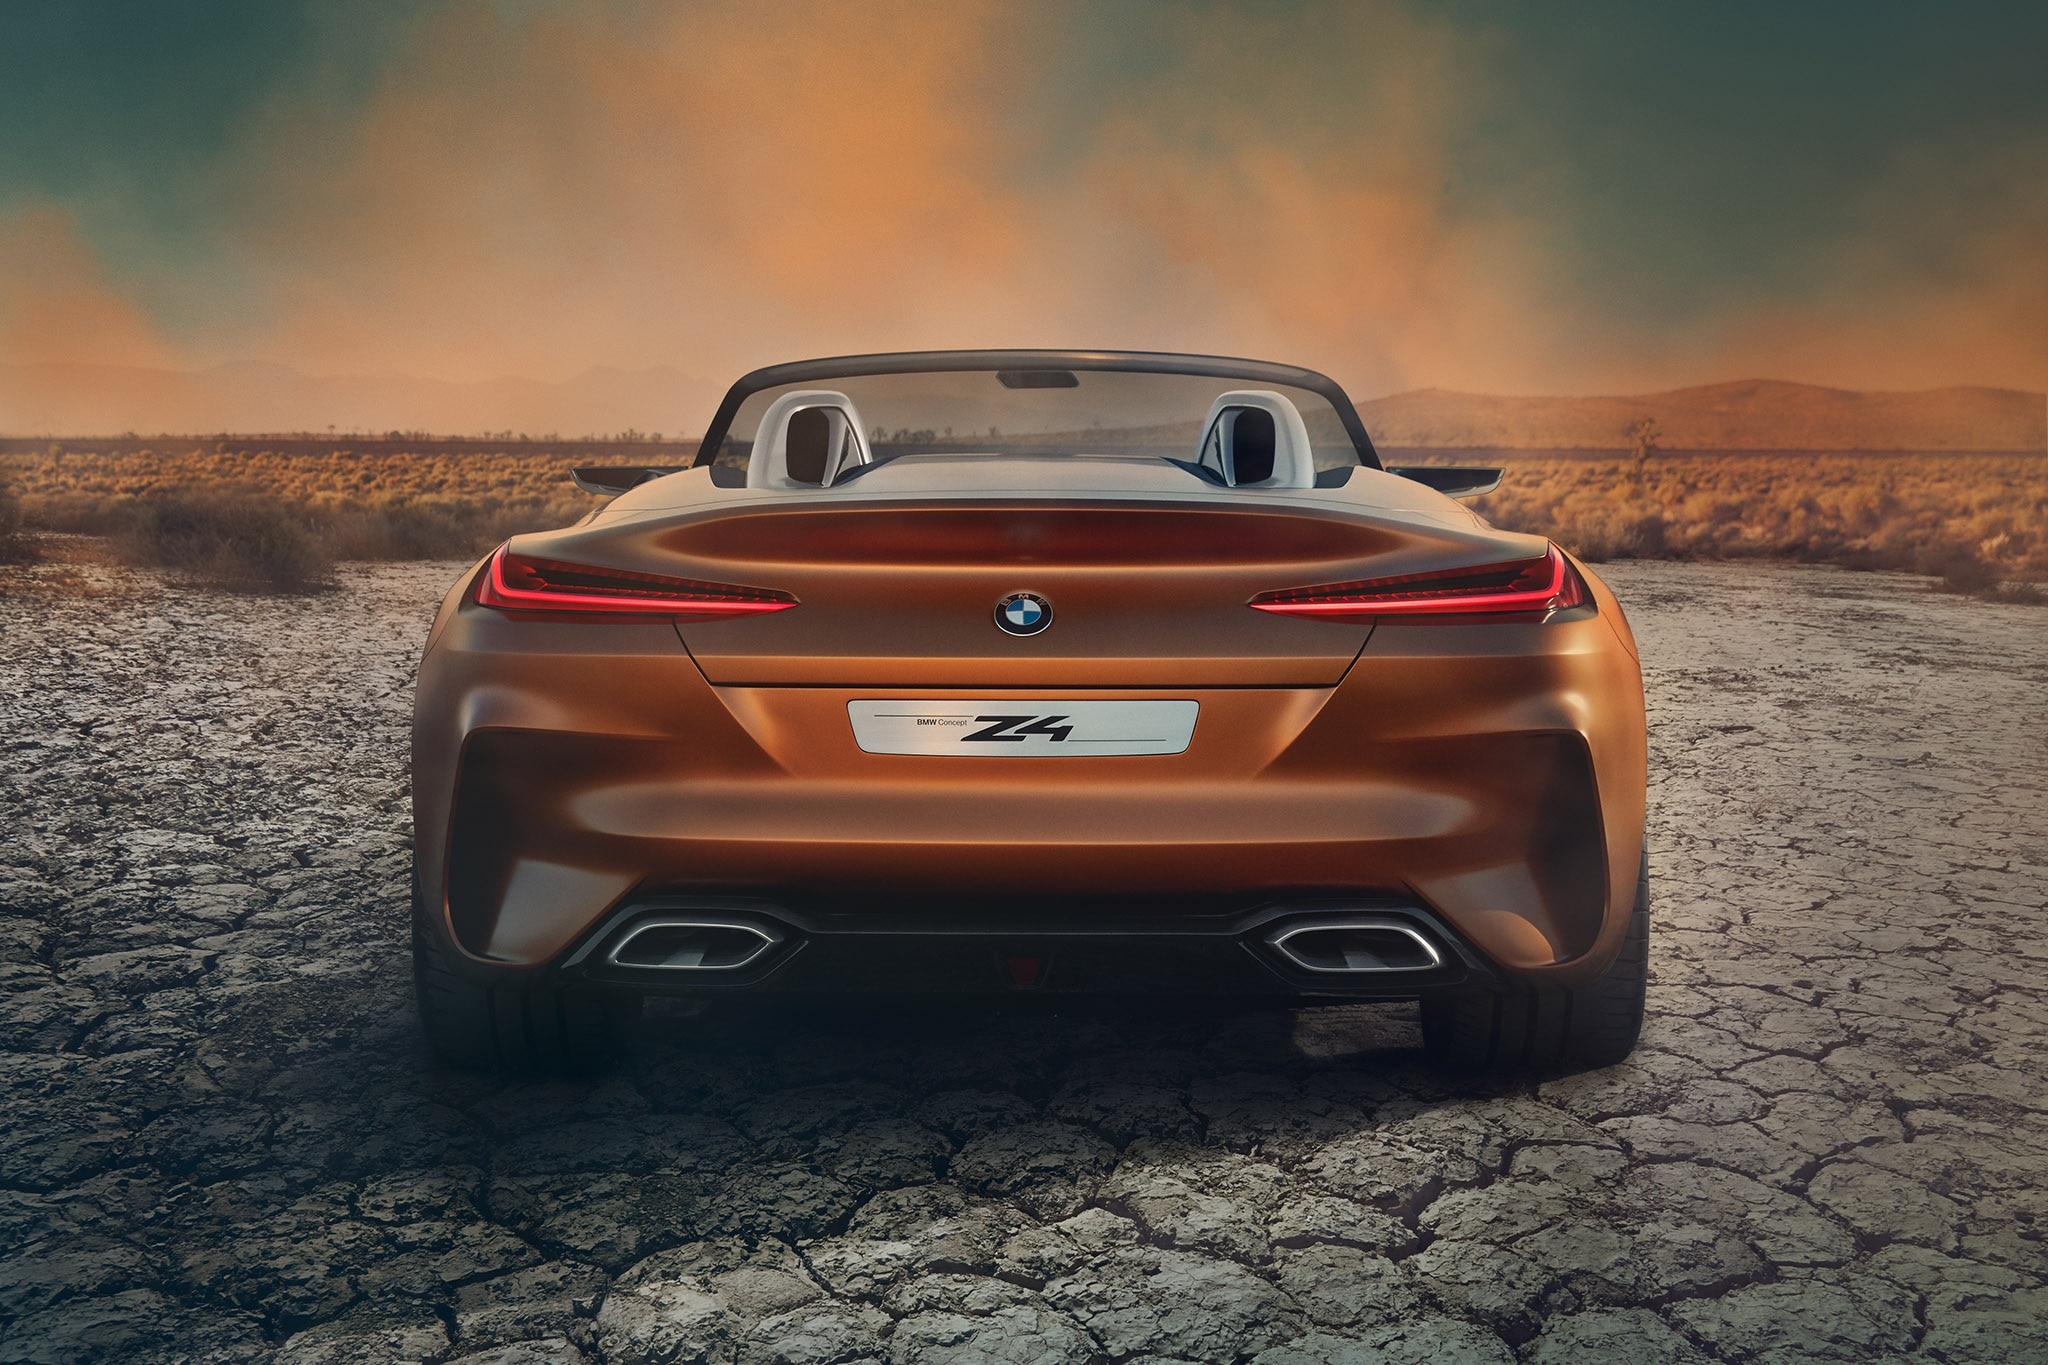 BMW-Concept-Z4-Rear-.jpg